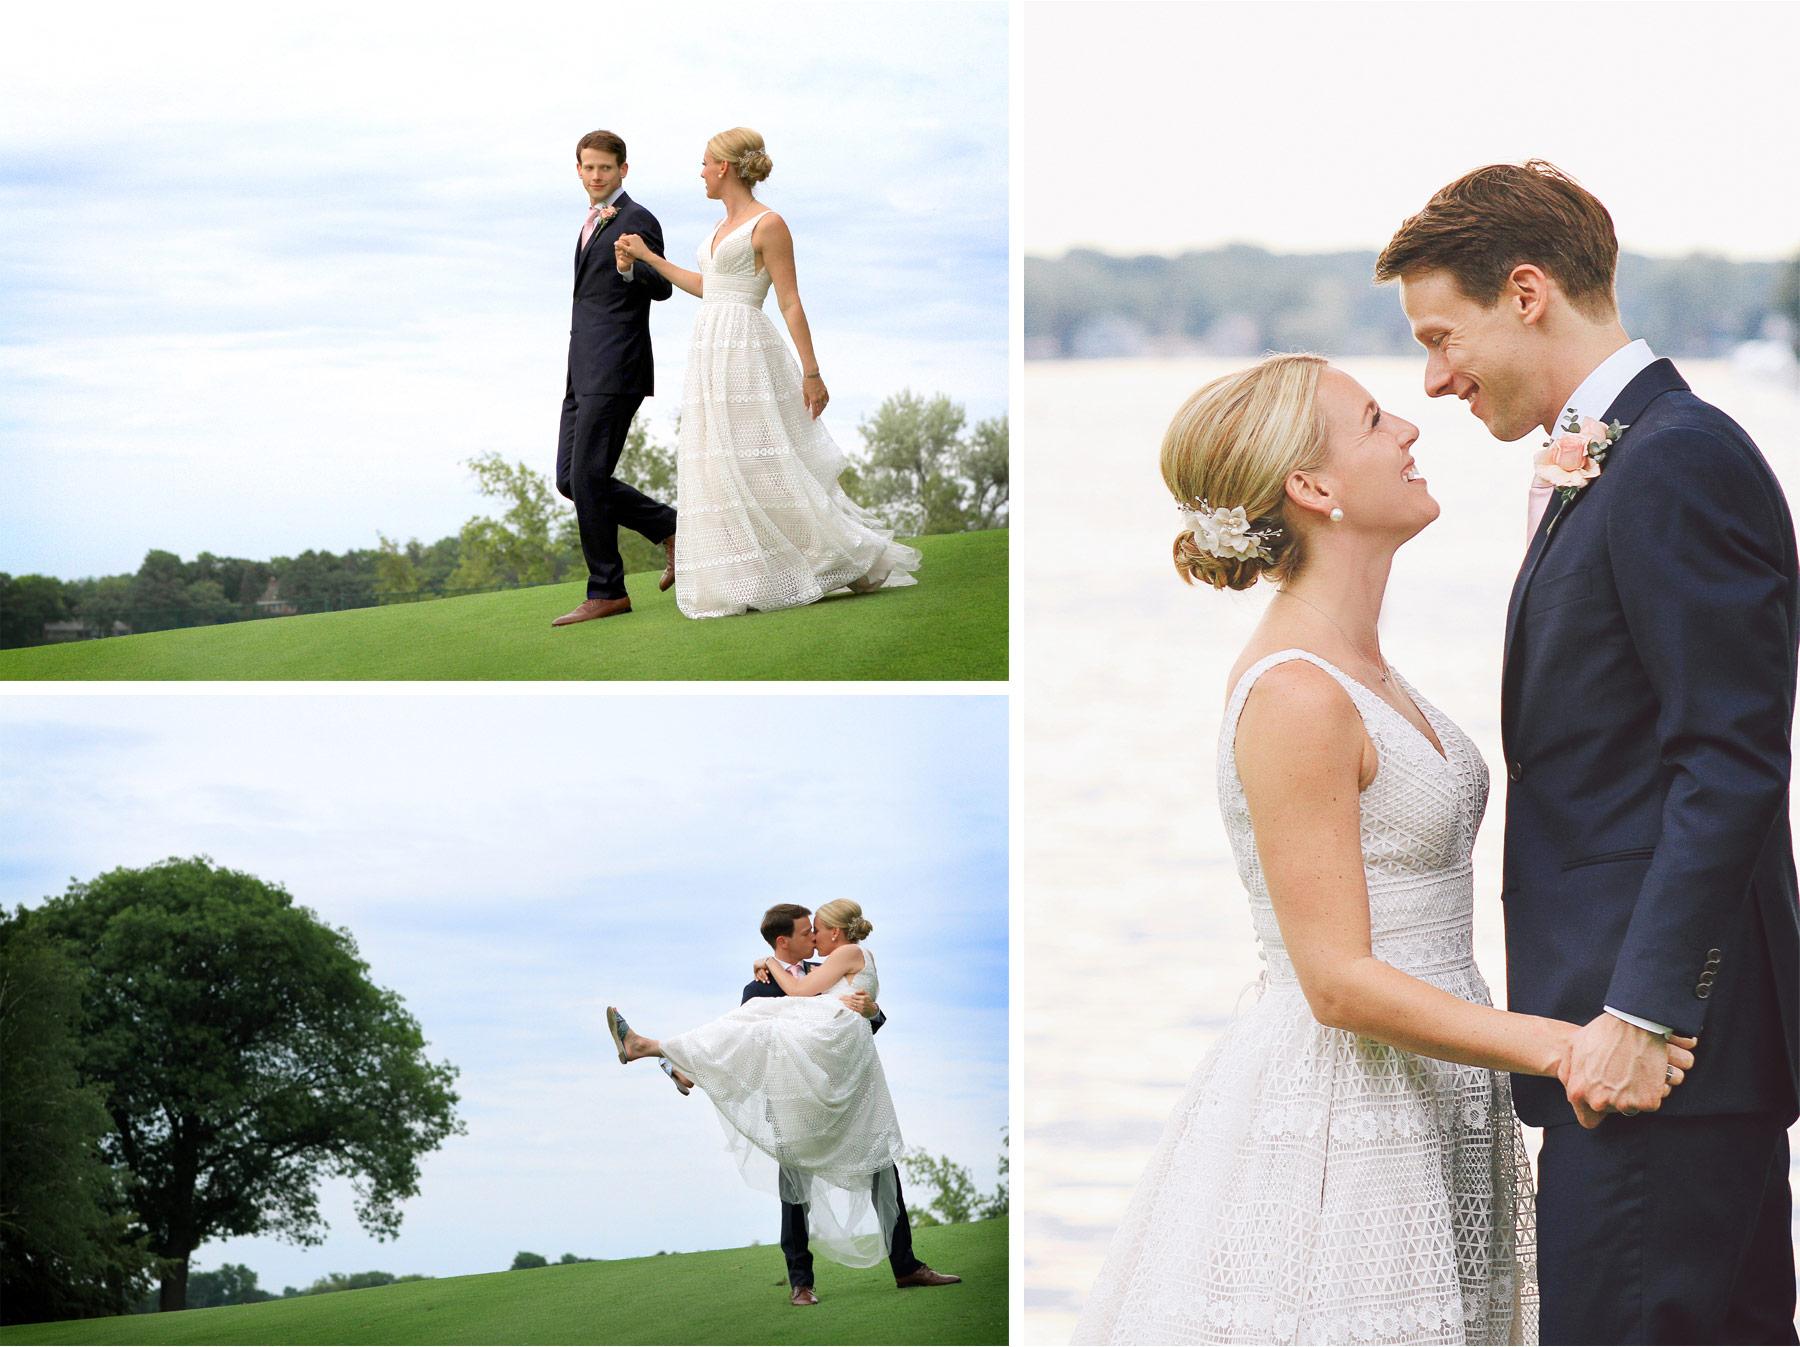 16-Minneapolis-Minnesota-Wedding-Photography-by-Vick-Photography-Lafayette-Club-Maggie-and-Nicholas.jpg